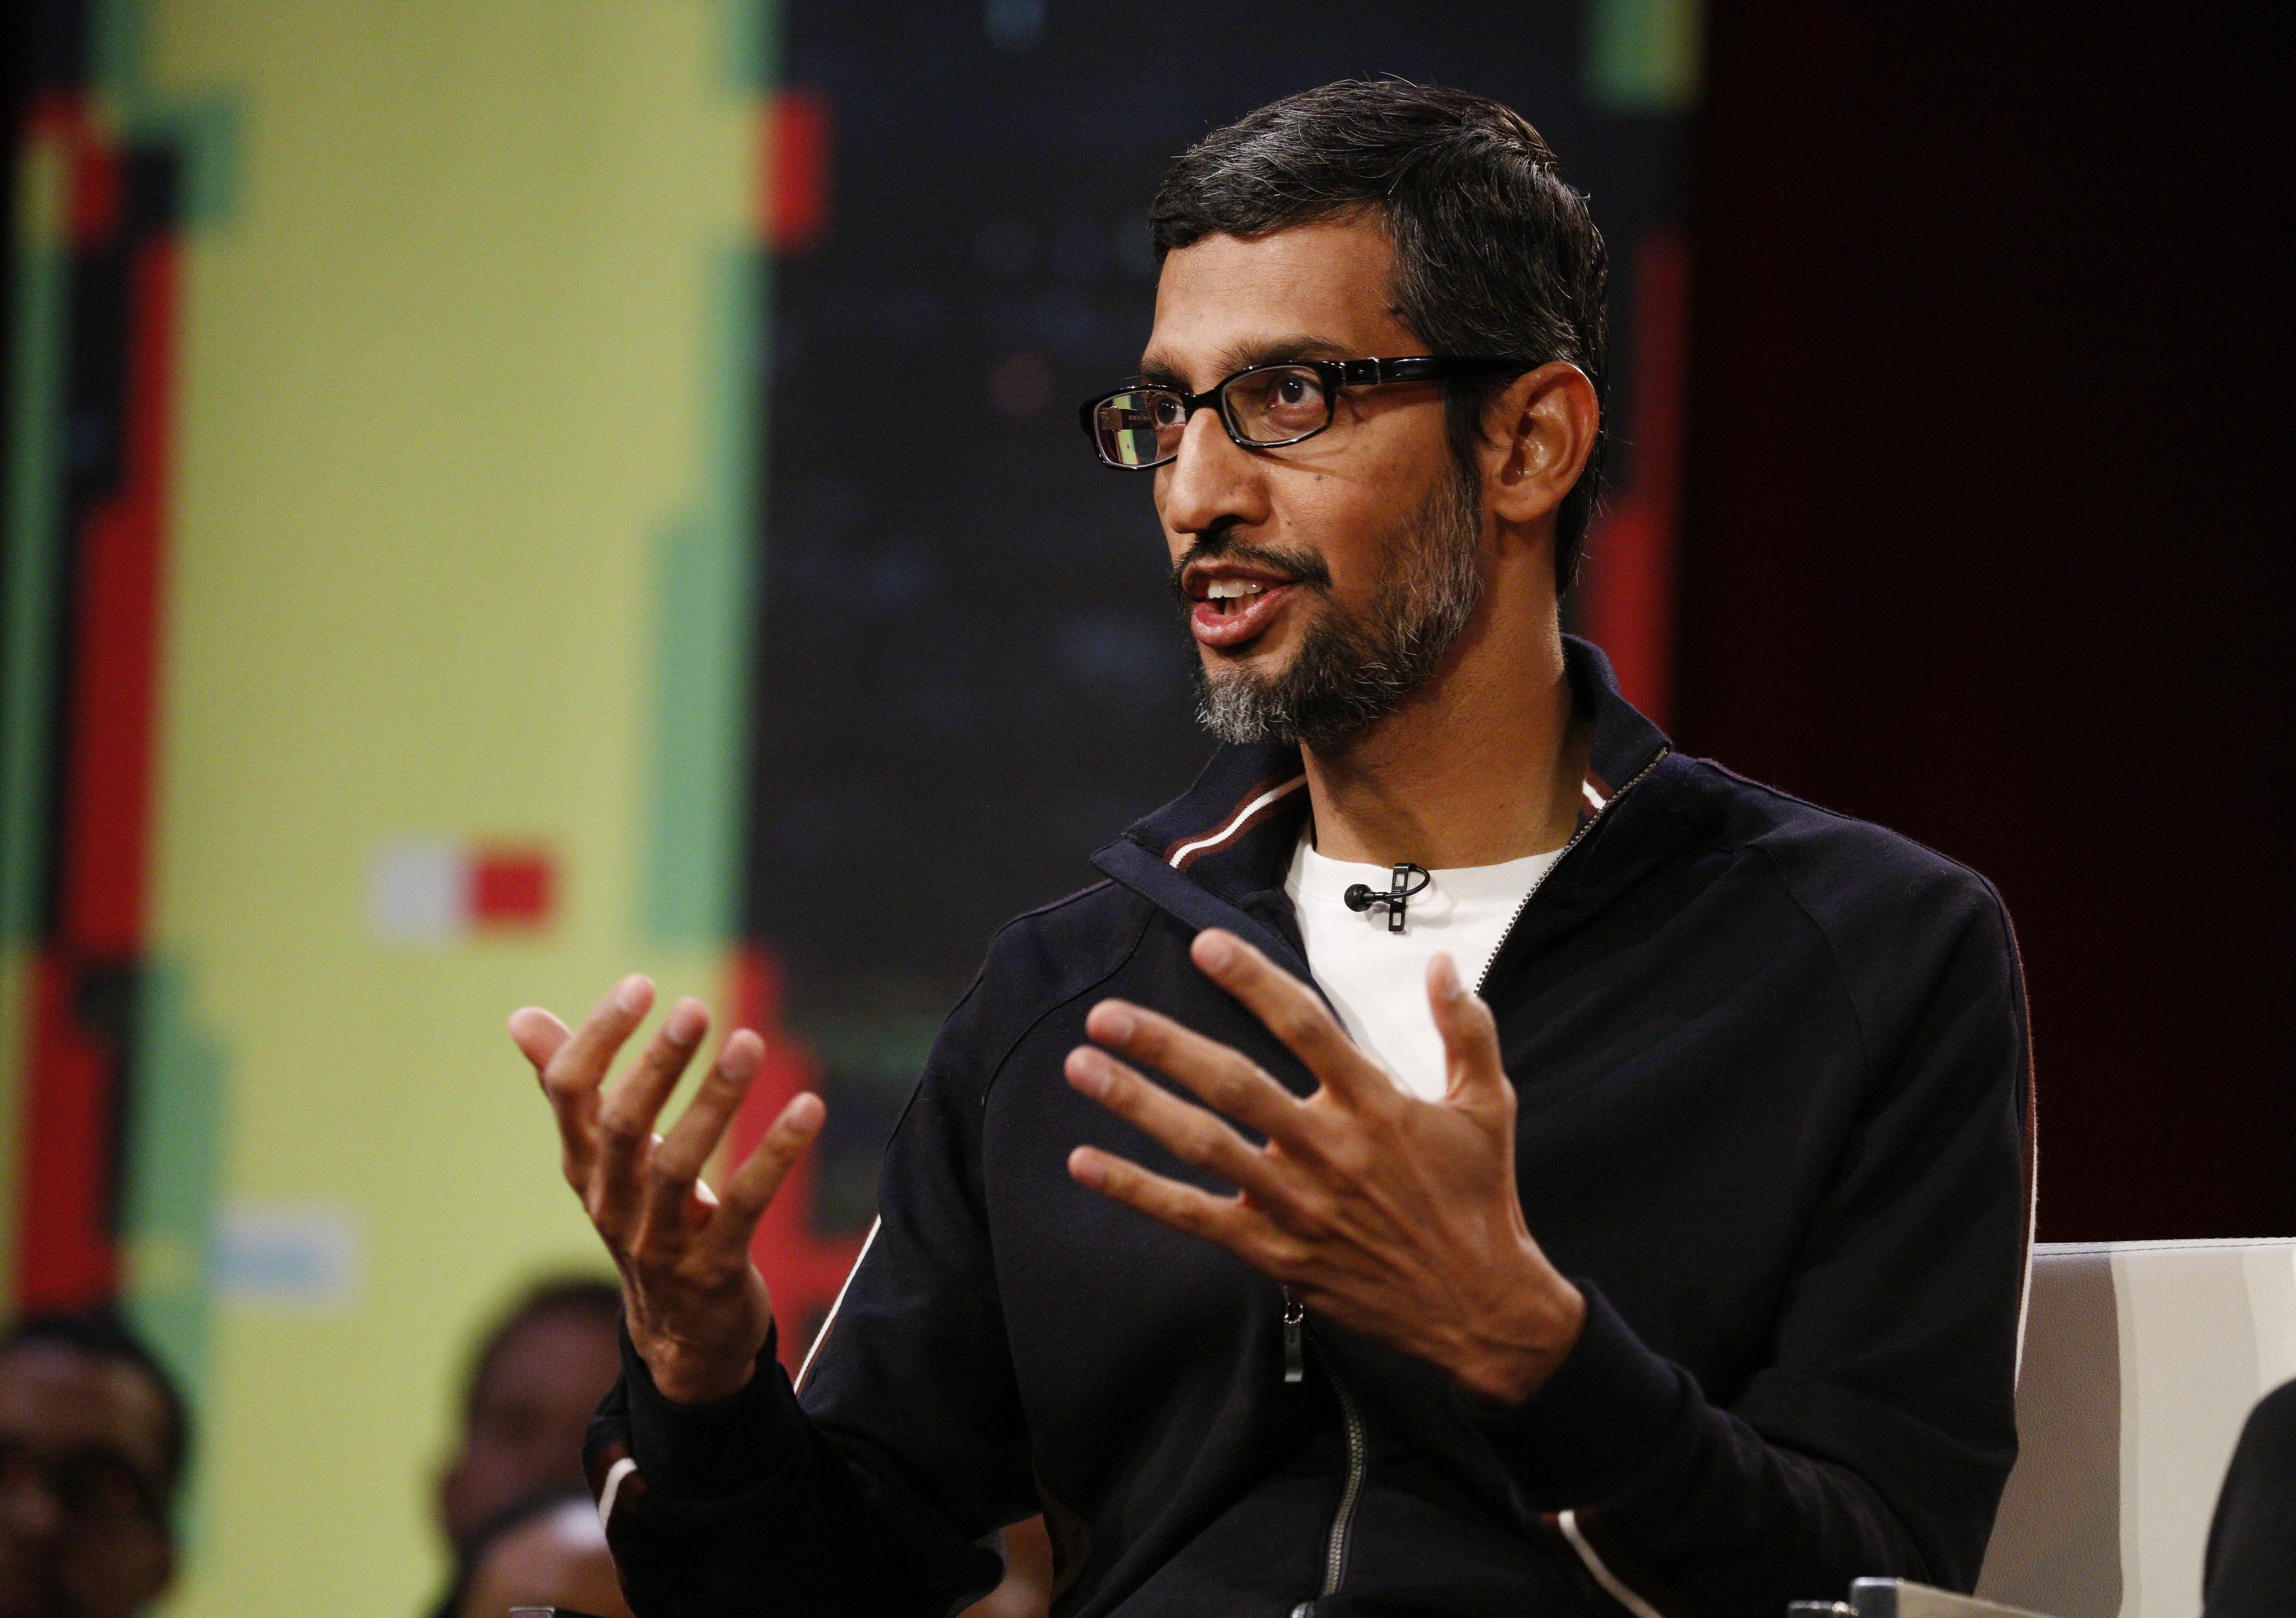 Google CEO Sundar Pichai onstage at Recode/MSNBC town hall